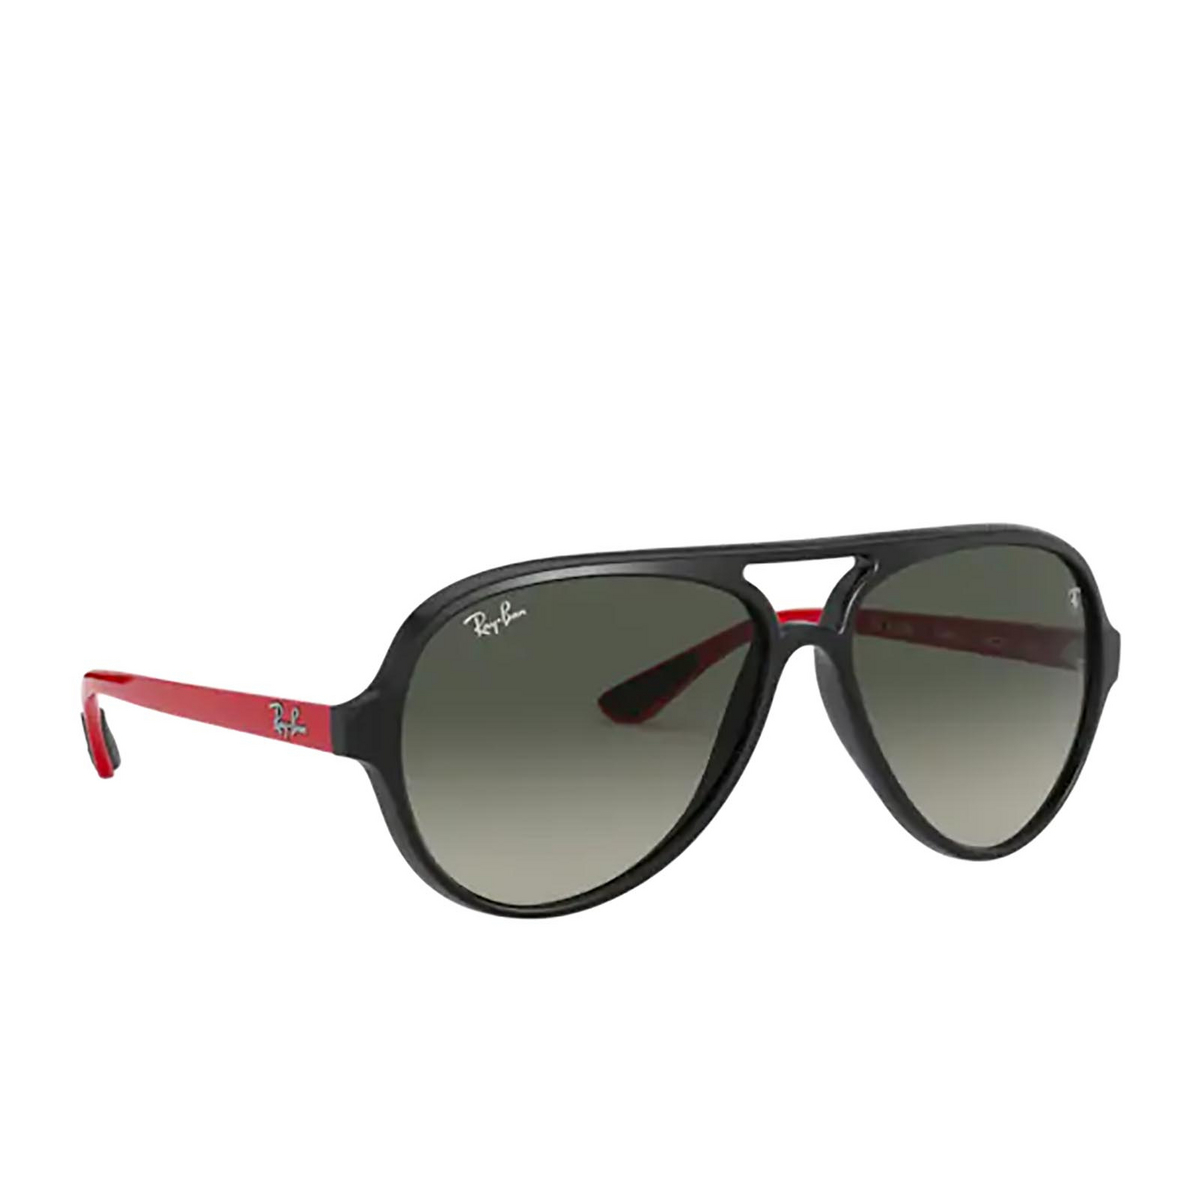 Ray-Ban® Aviator Sunglasses: RB4125M color Black F64471 - 2/3.